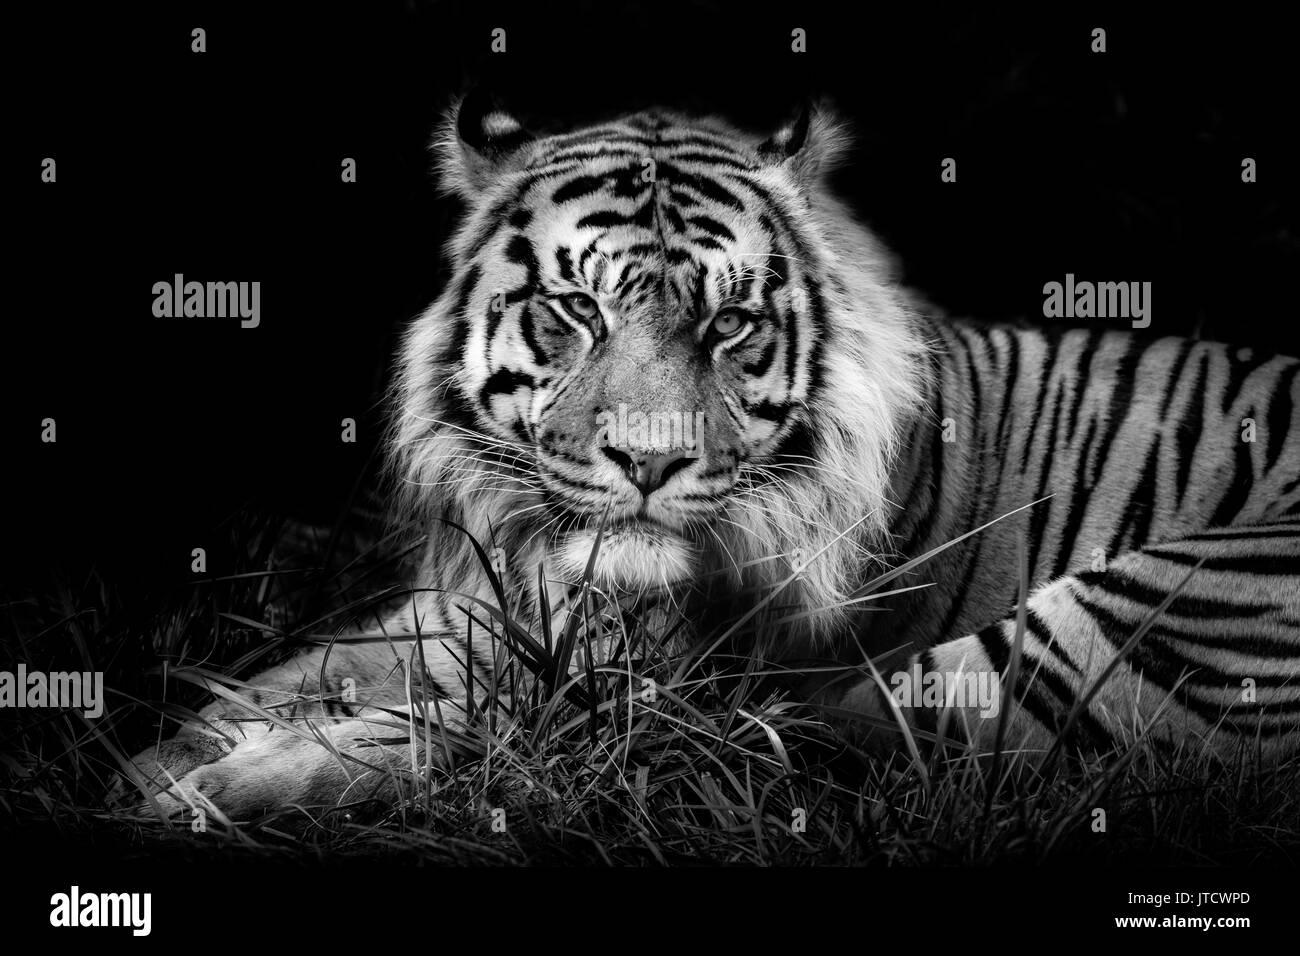 Macho de tigre de Sumatra, Jae Jae, contra un fondo negro Imagen De Stock